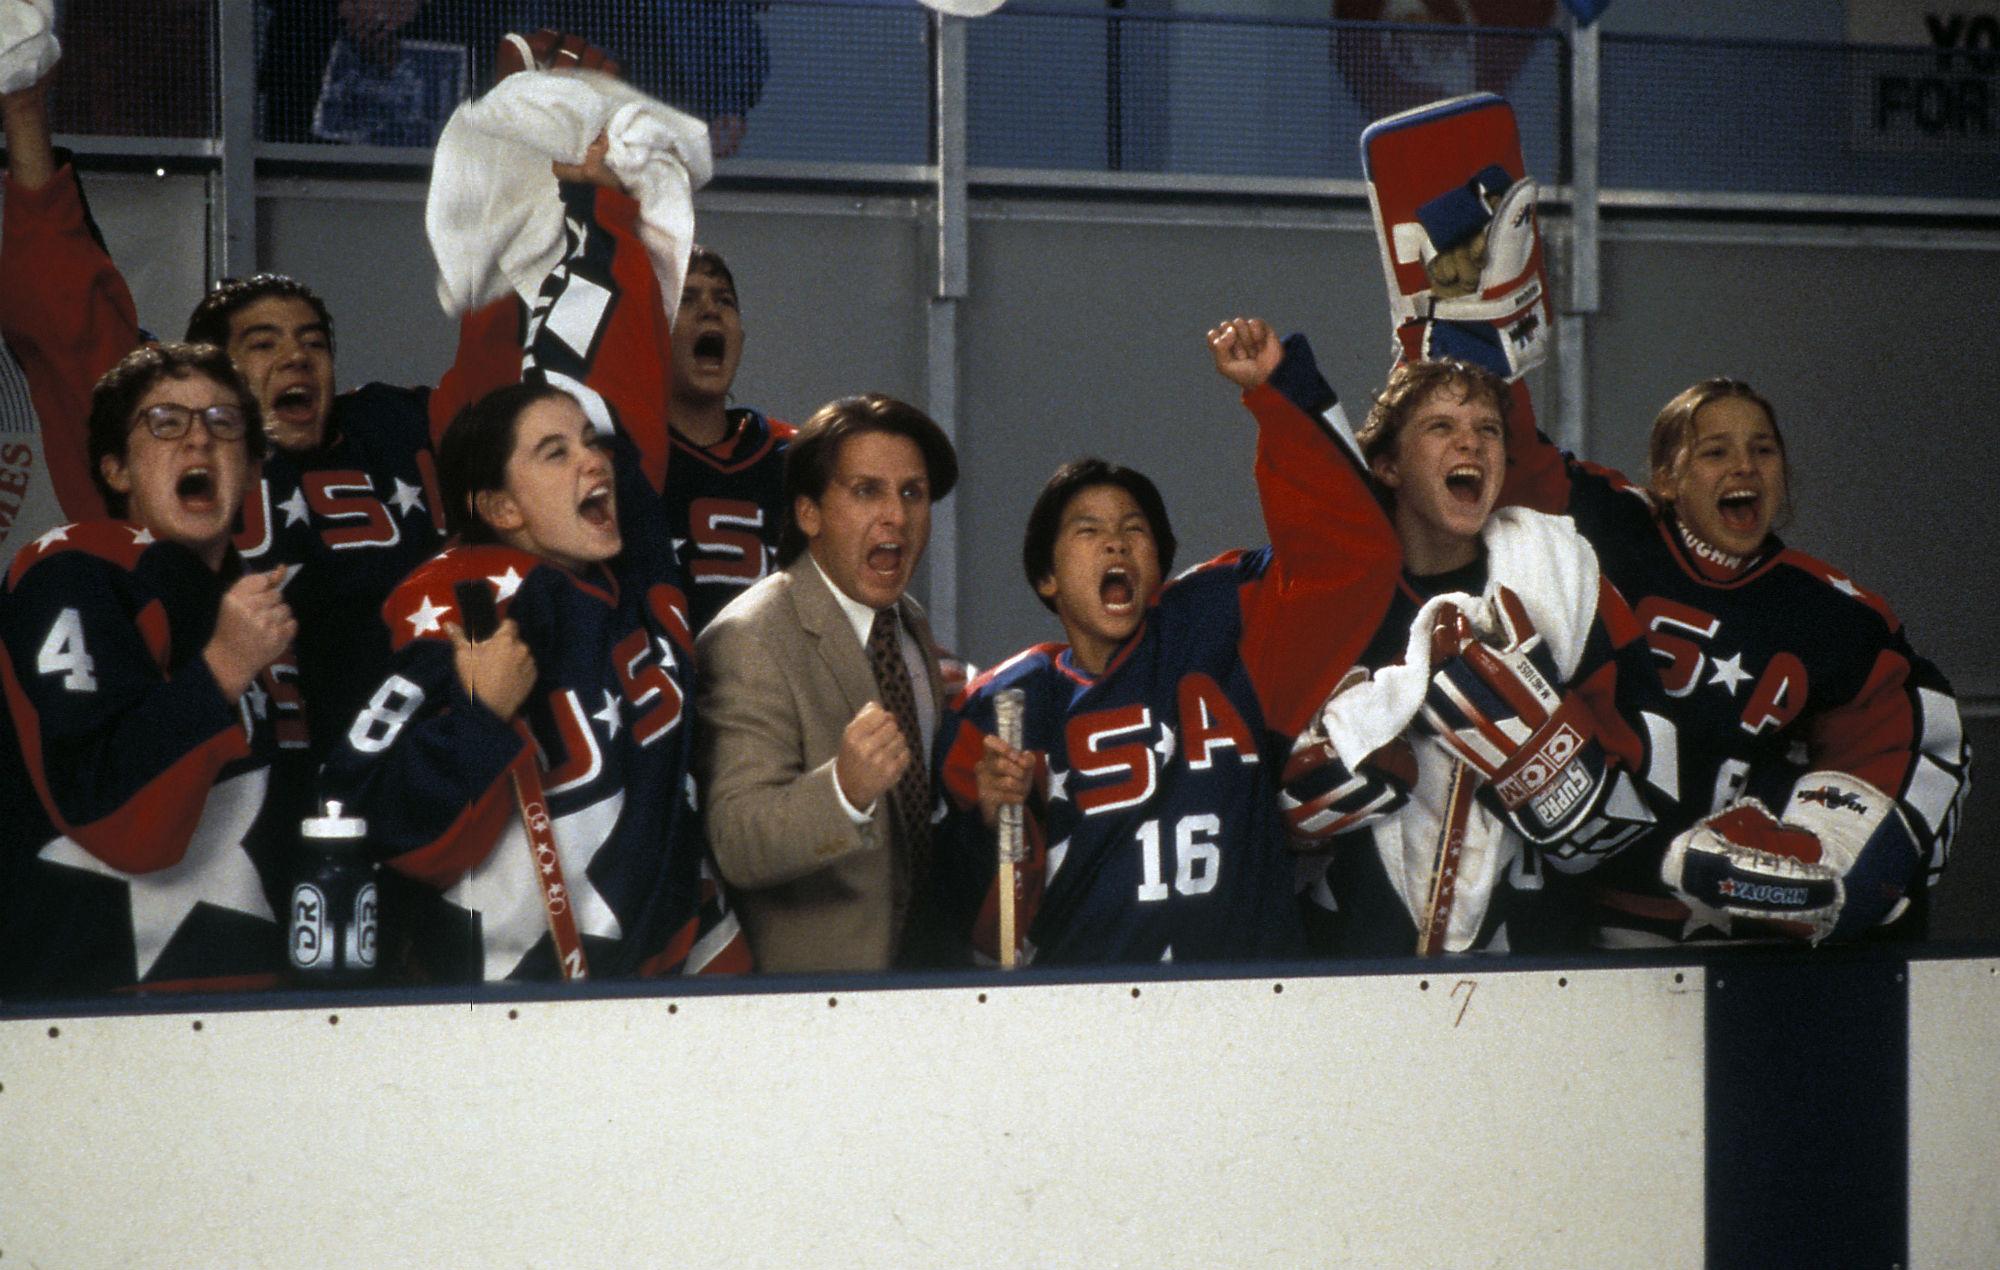 'The Mighty Ducks'